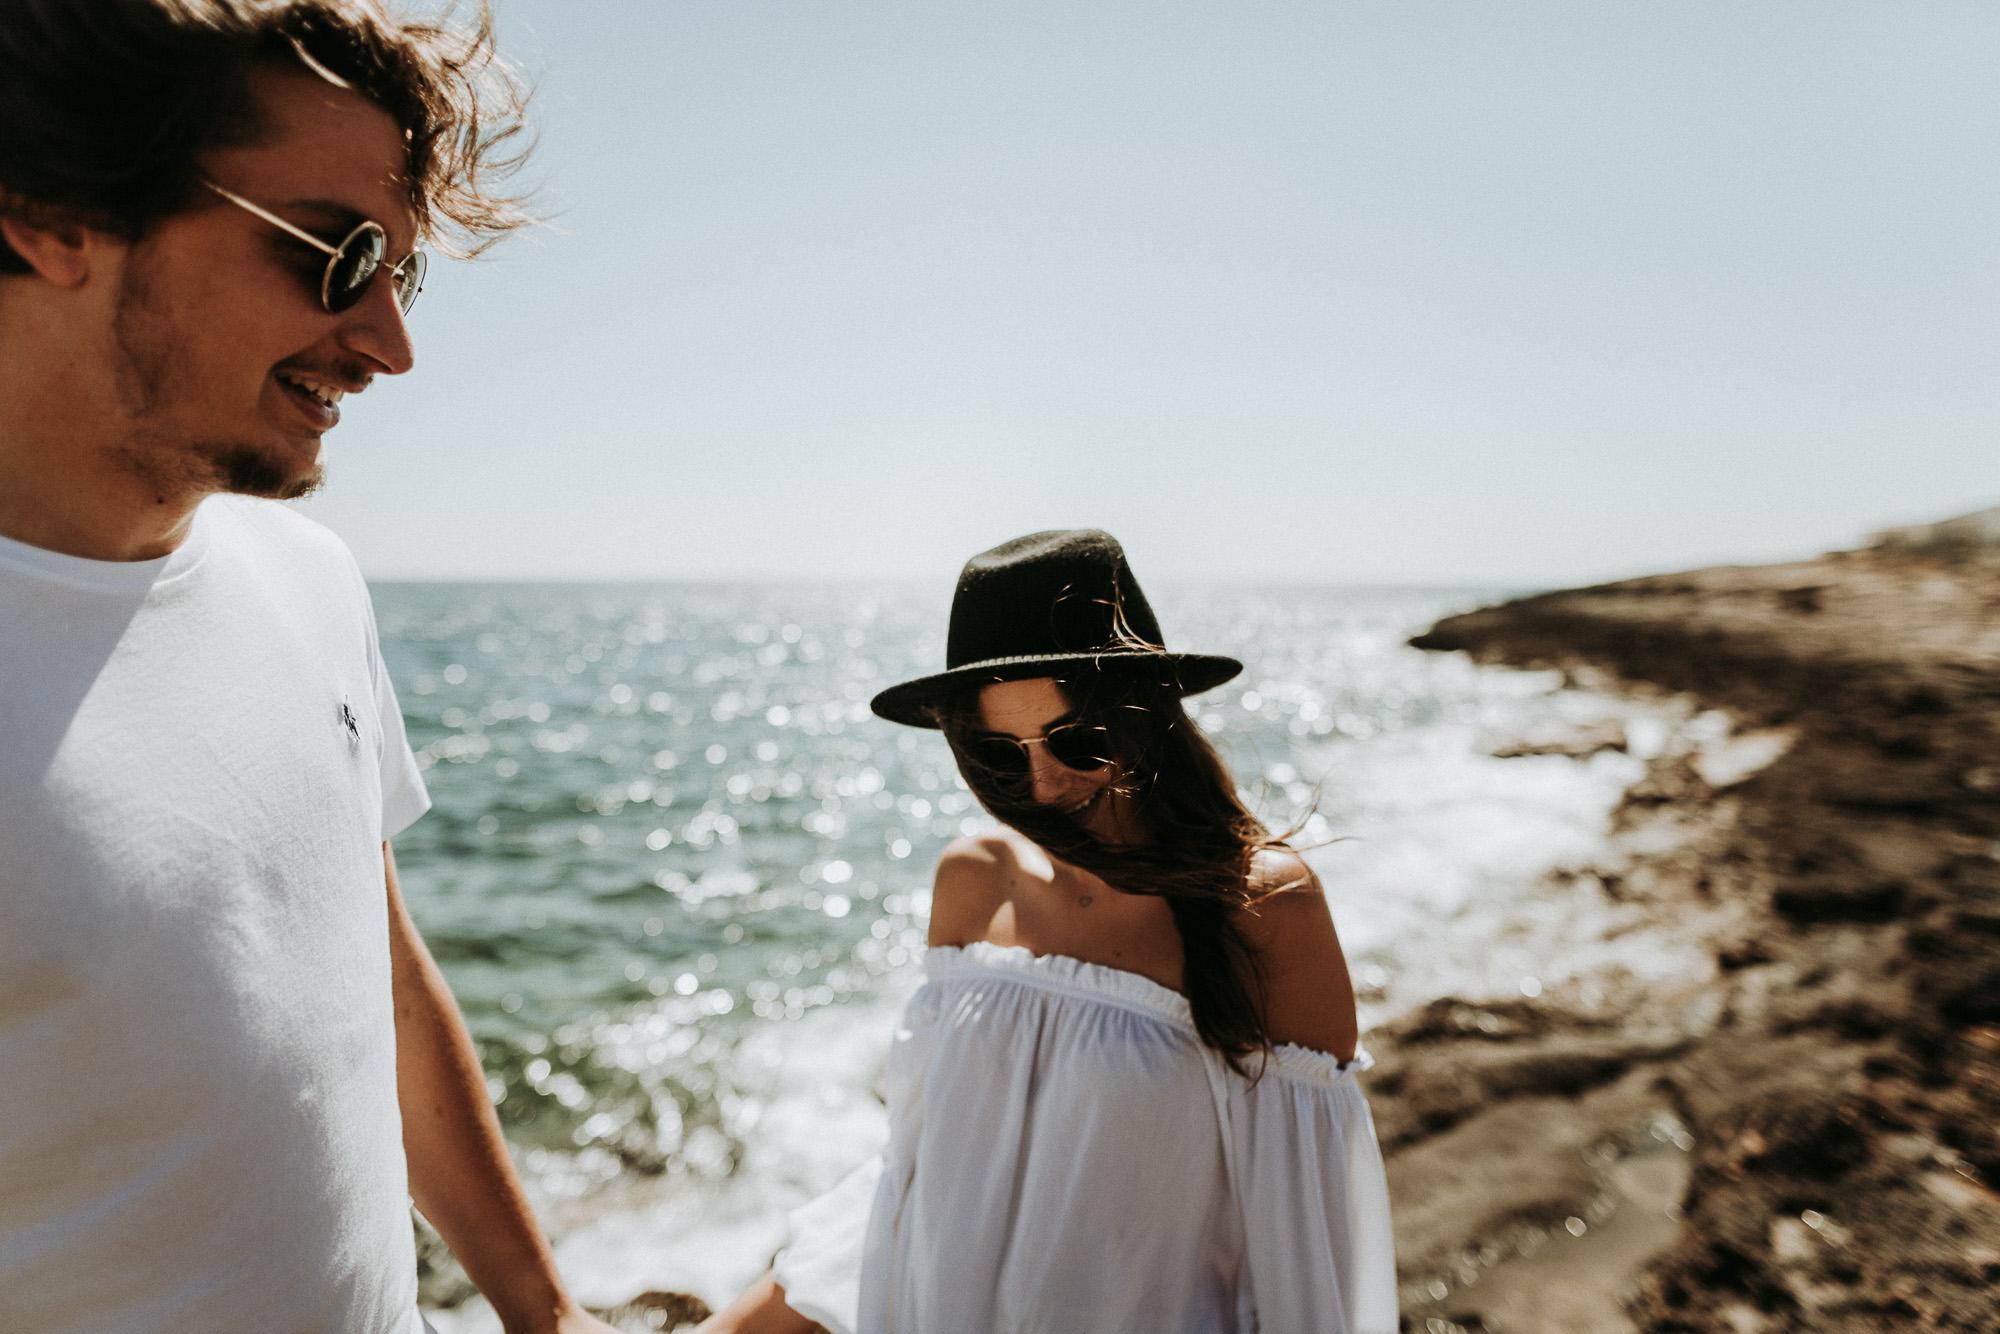 DanielaMarquardtPhotography_wedding_elopement_mallorca_spain_stjordi_sessalines_marinaandxavi18